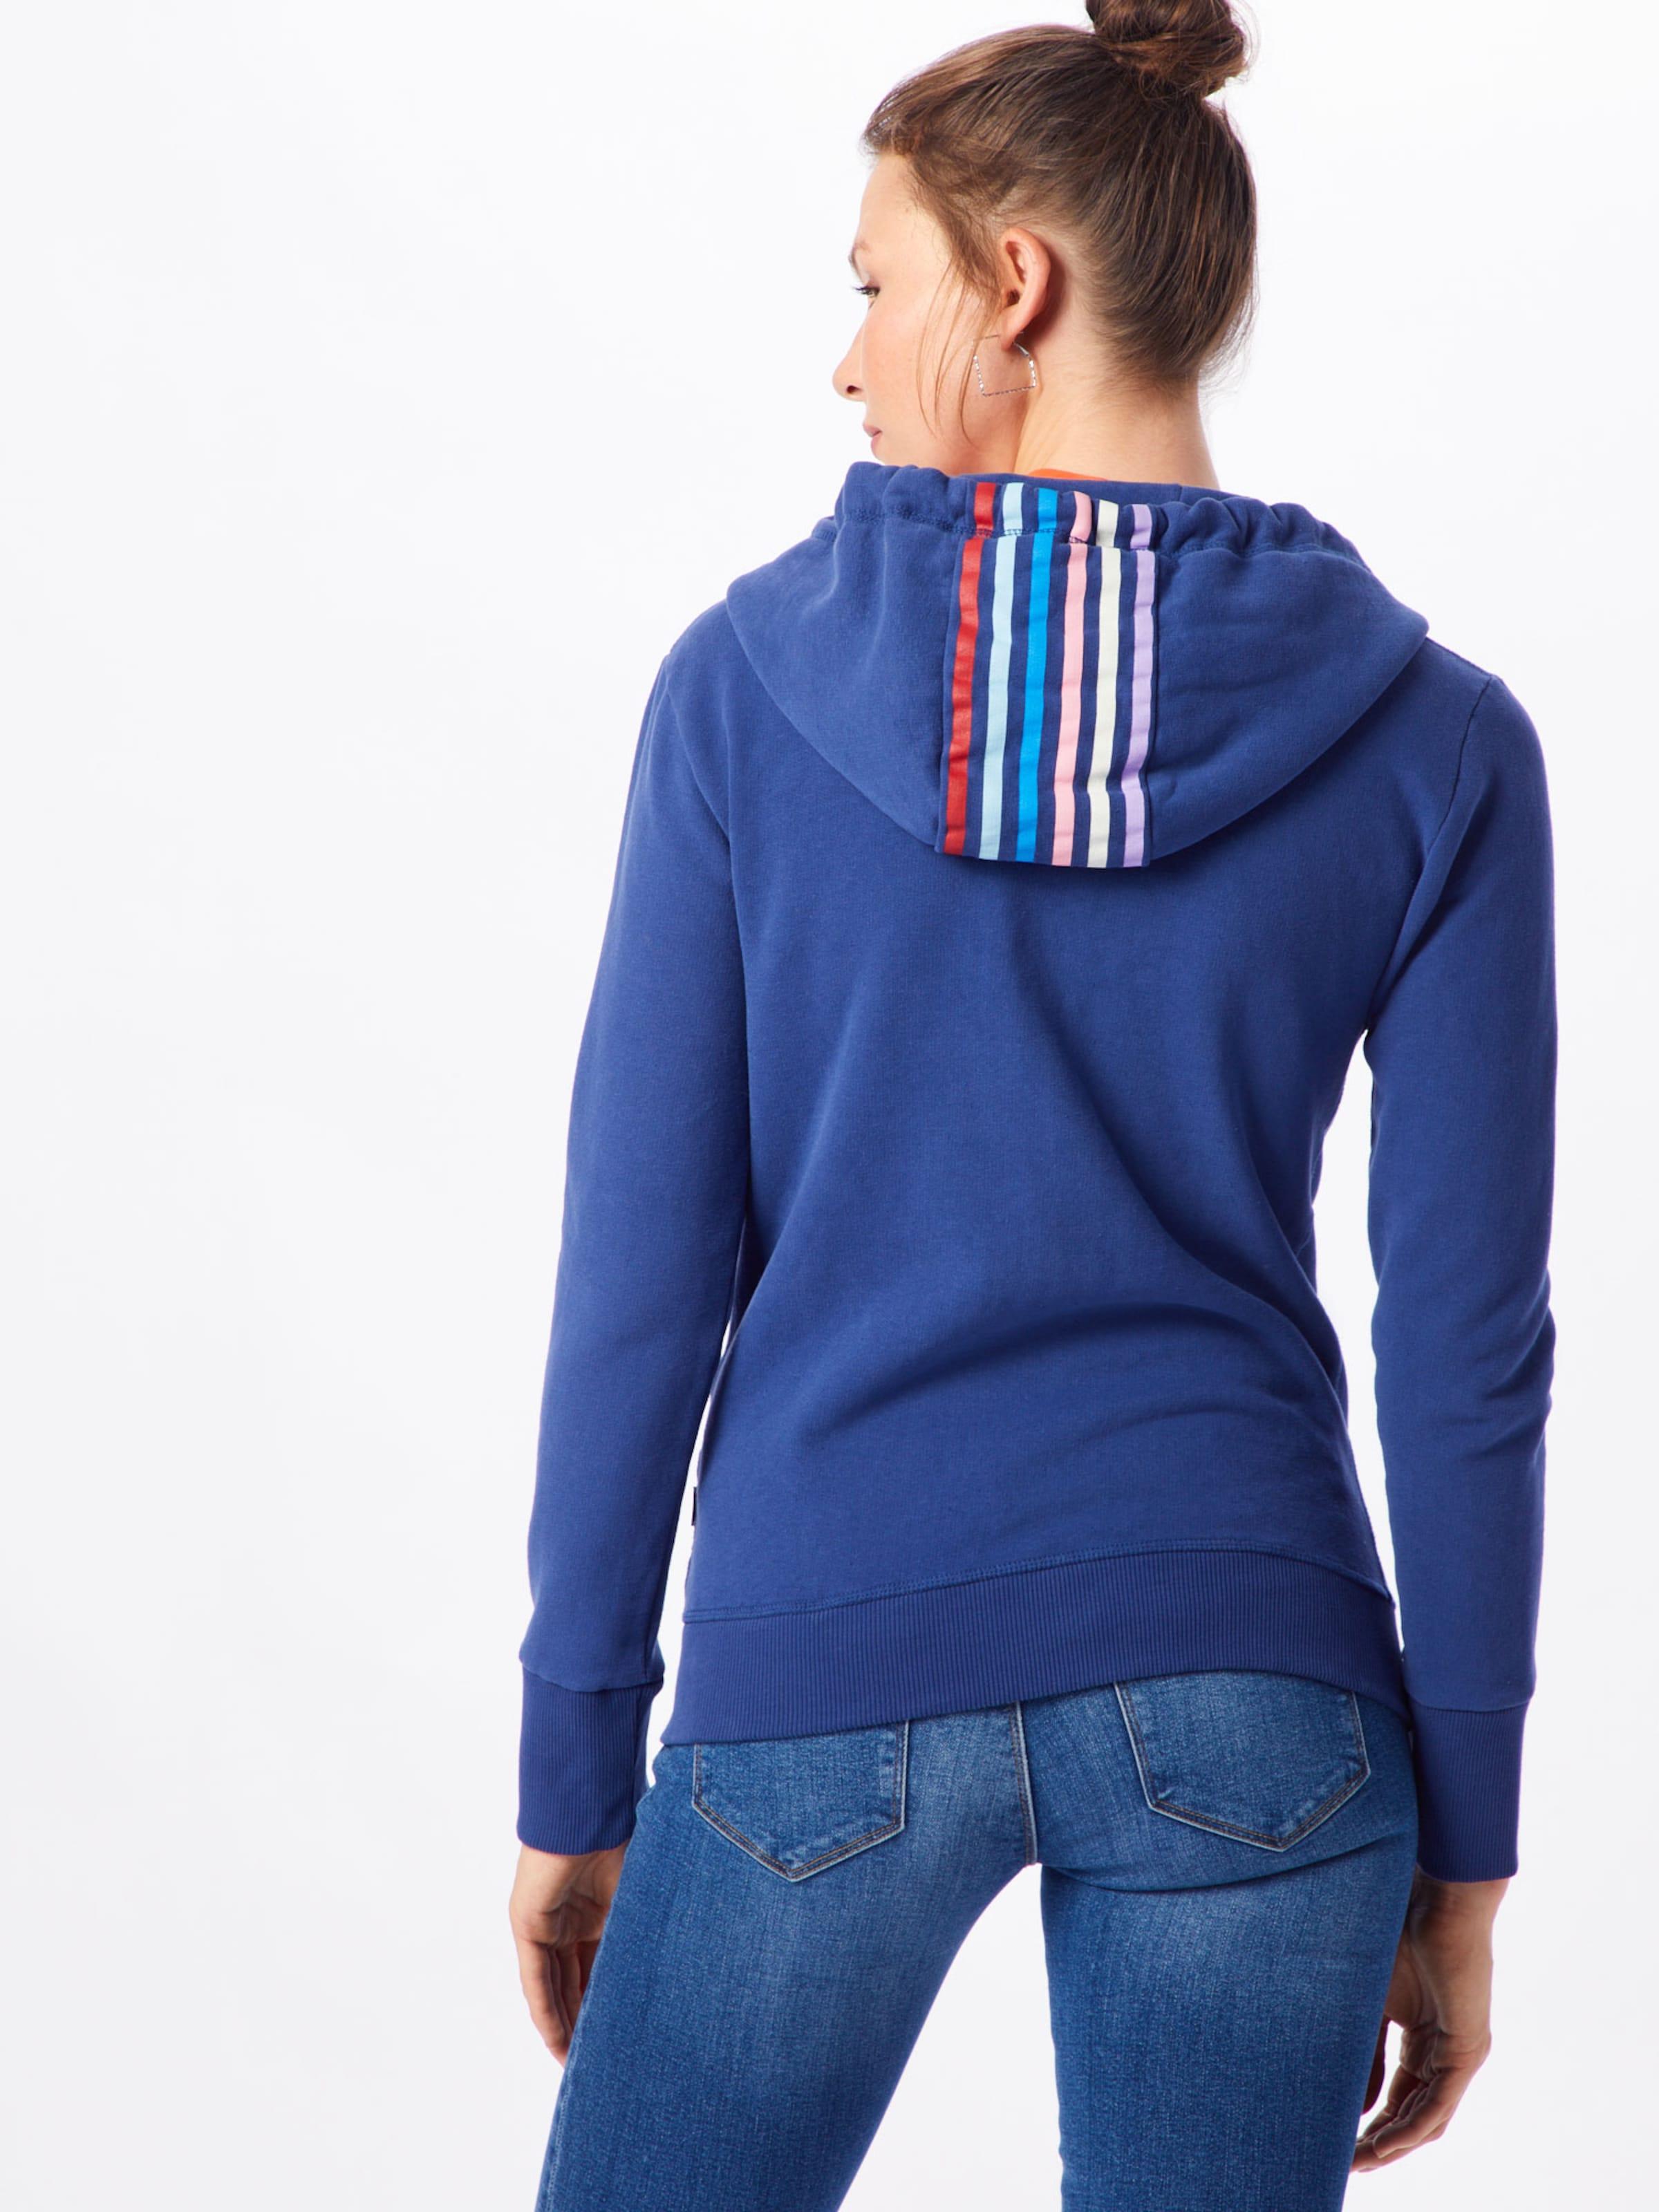 Sweat Bleu shirt 'rainbow' Marine En Superdry 34AjLq5R